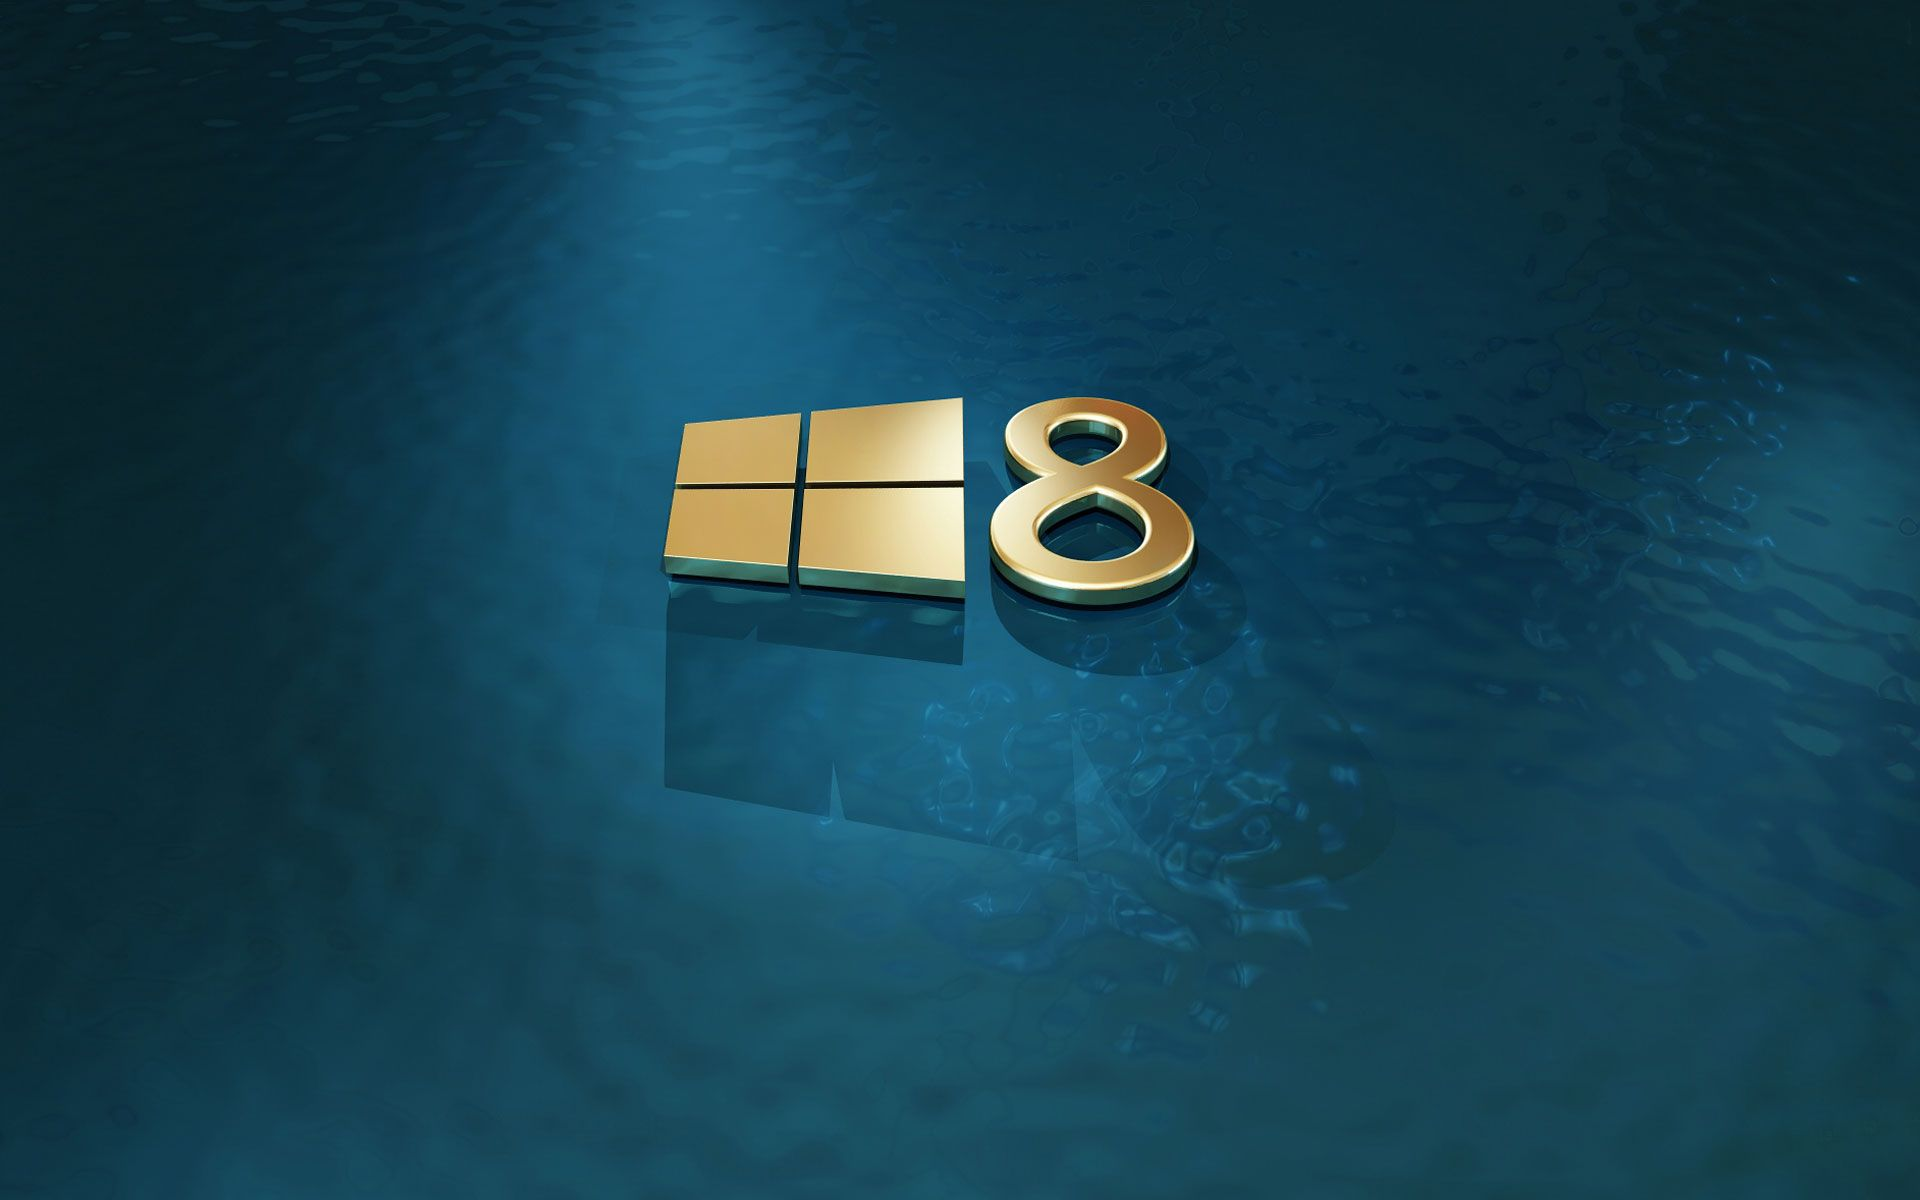 Windows 8 Wallpapers   Top Windows 8 Backgrounds 1920x1200